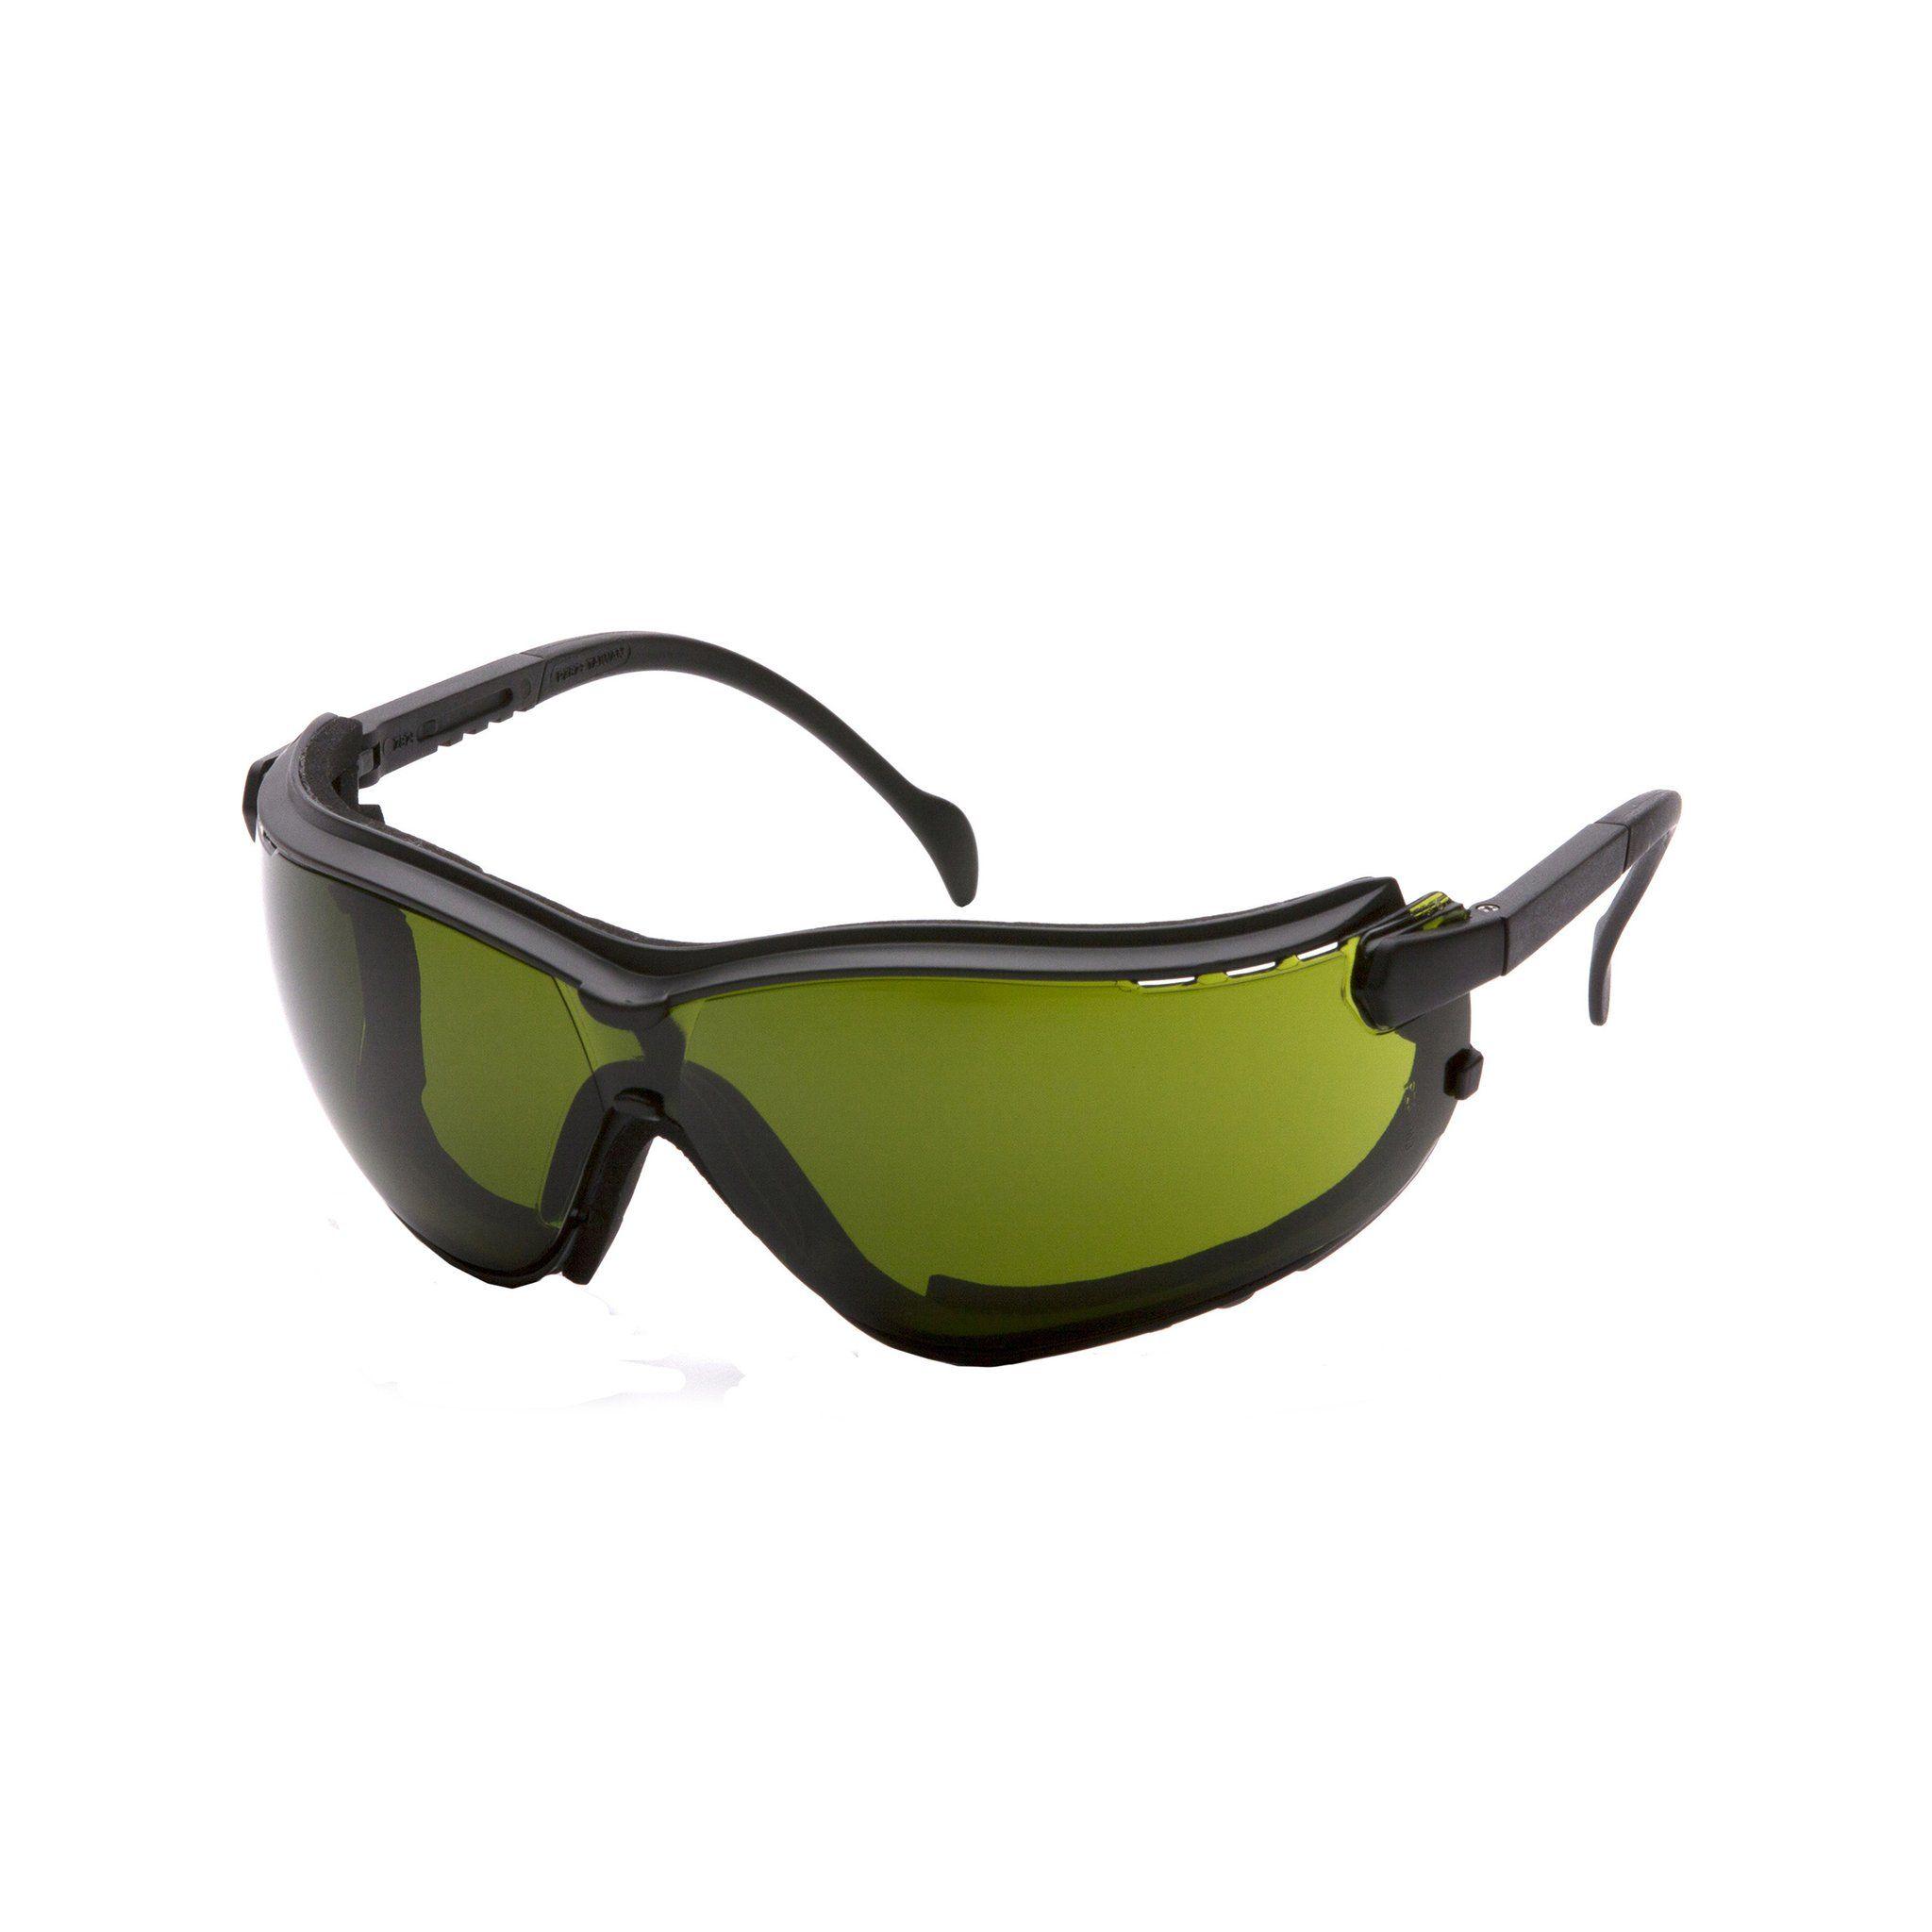 V2G AntiFog Safety Glasses with IR Filter Pyramex